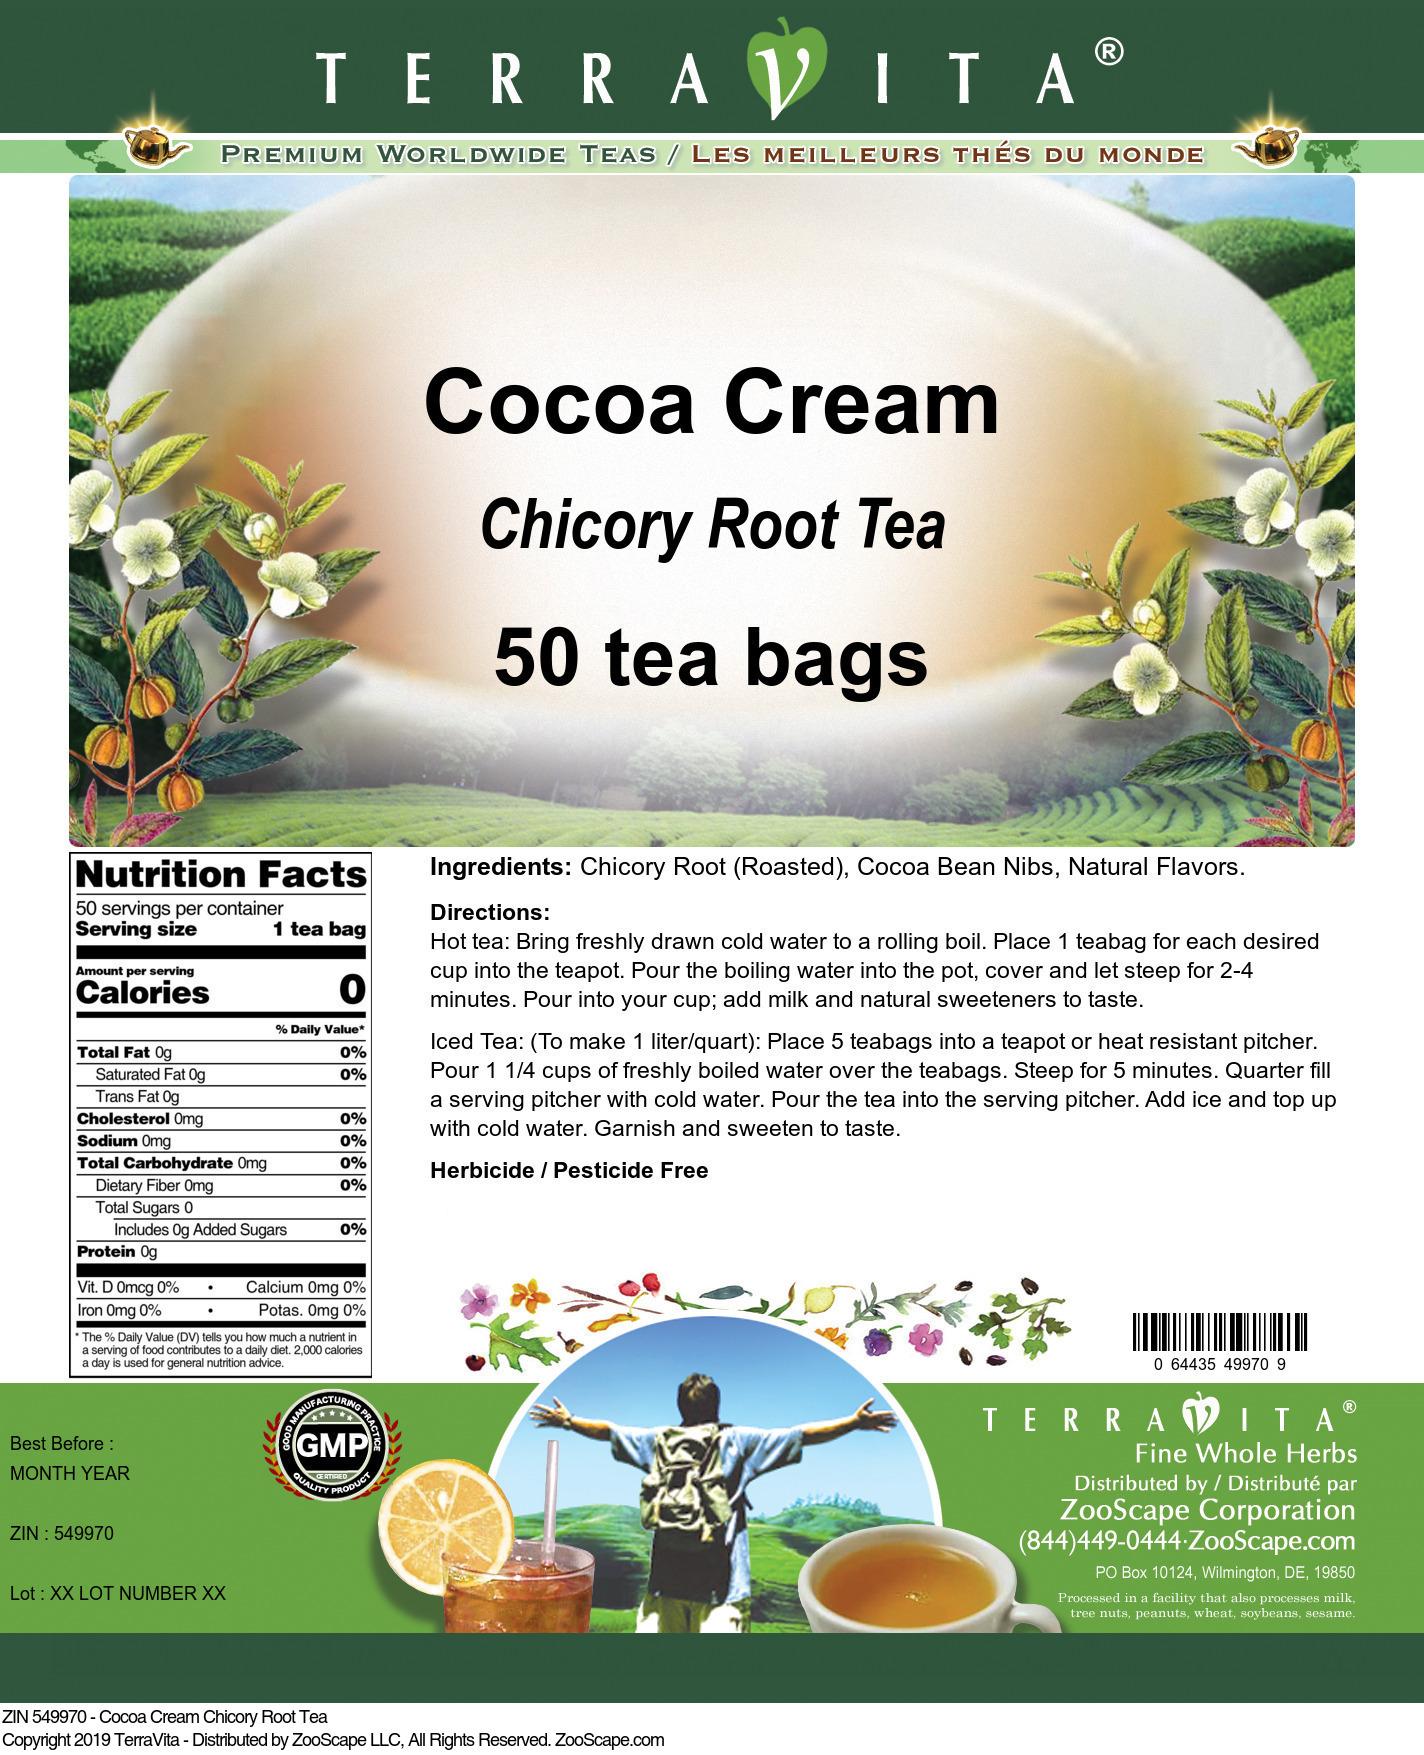 Cocoa Cream Chicory Root Tea